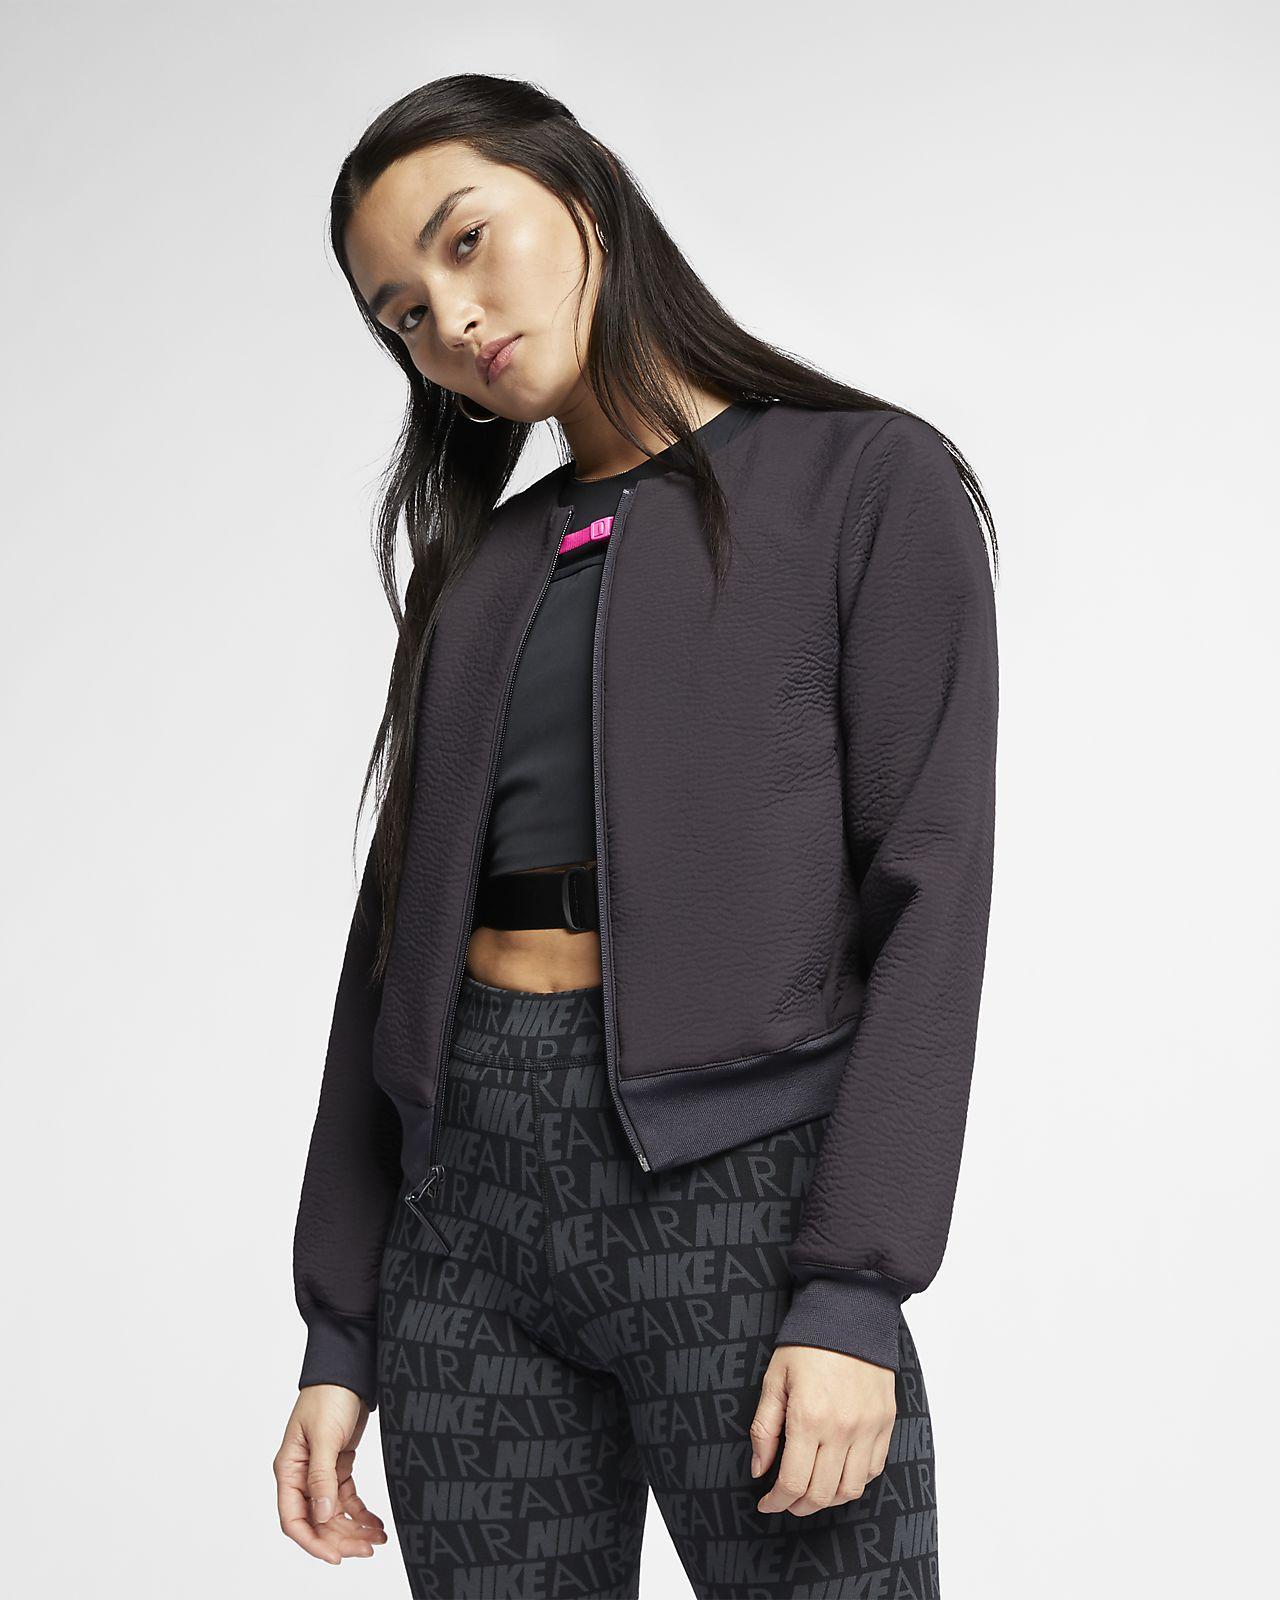 Nike Sportswear Tech Pack Damenjacke mit durchgehendem Reißverschluss